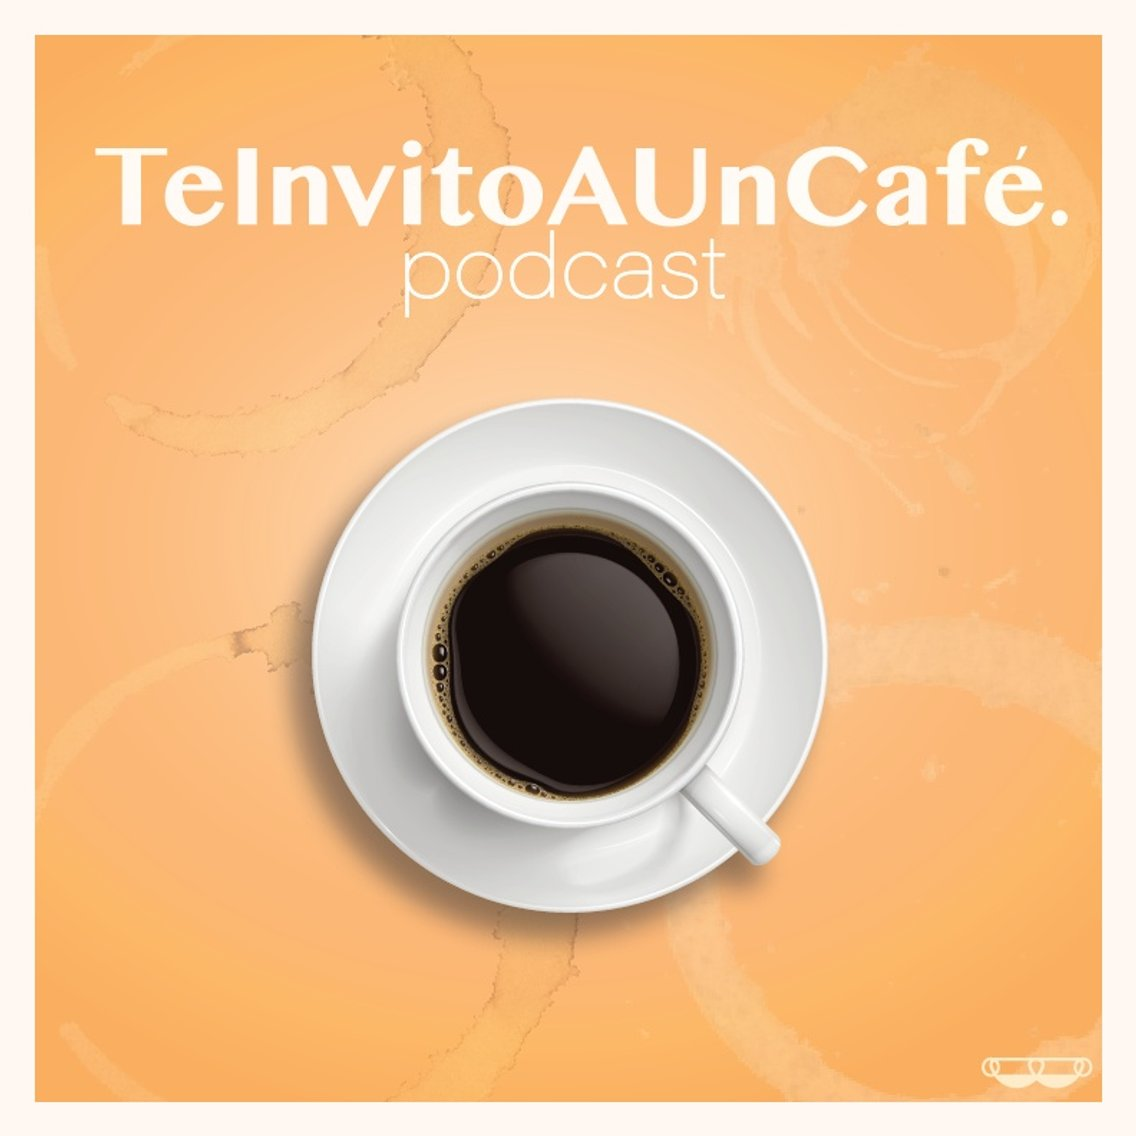 TeInvitoAUnCafé. podcast - imagen de portada